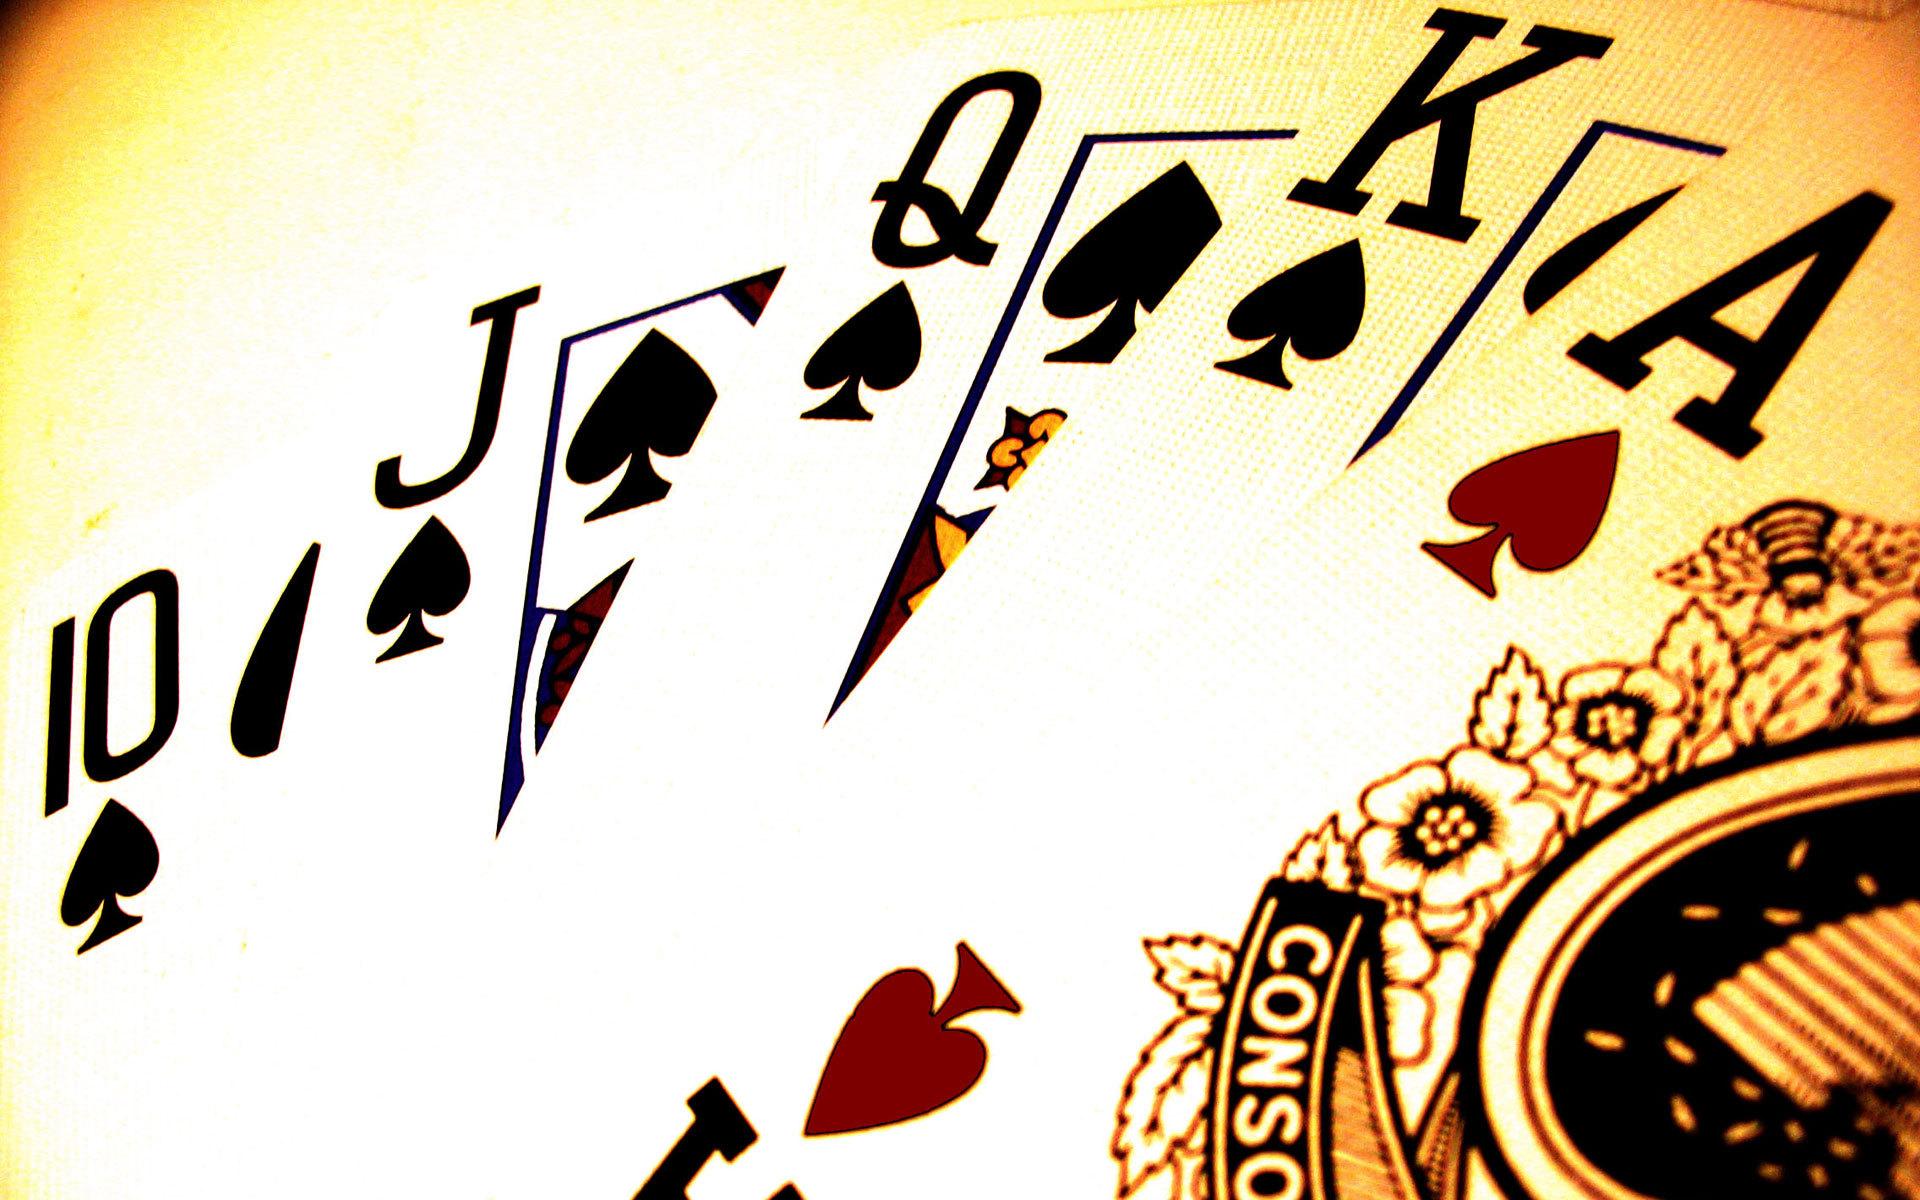 заставки покер